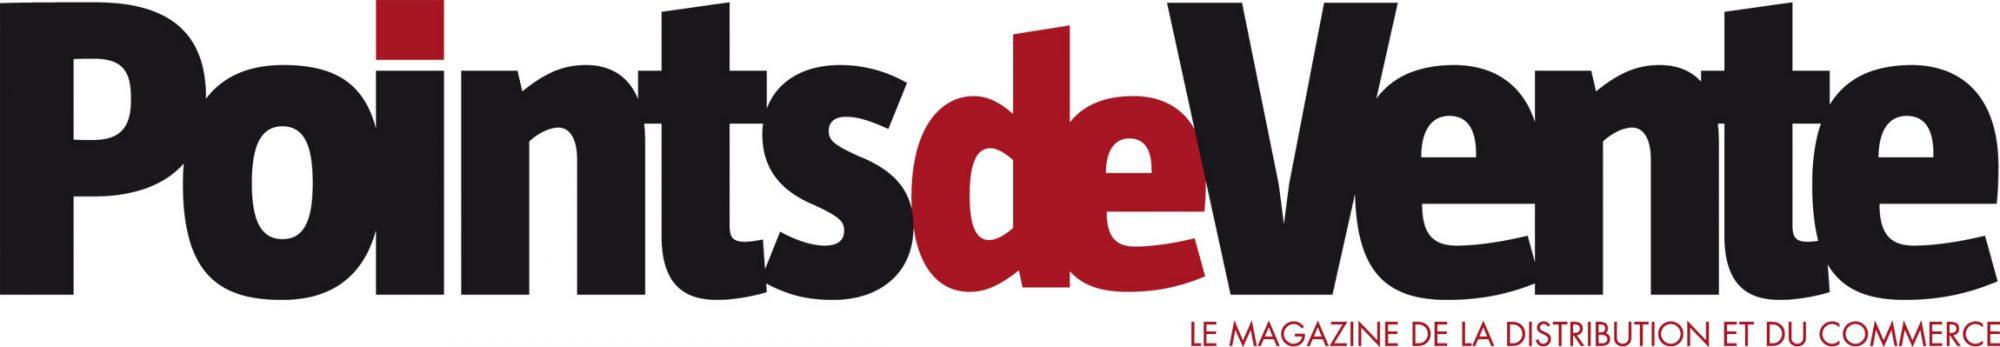 logo_point-de-vente.jpg